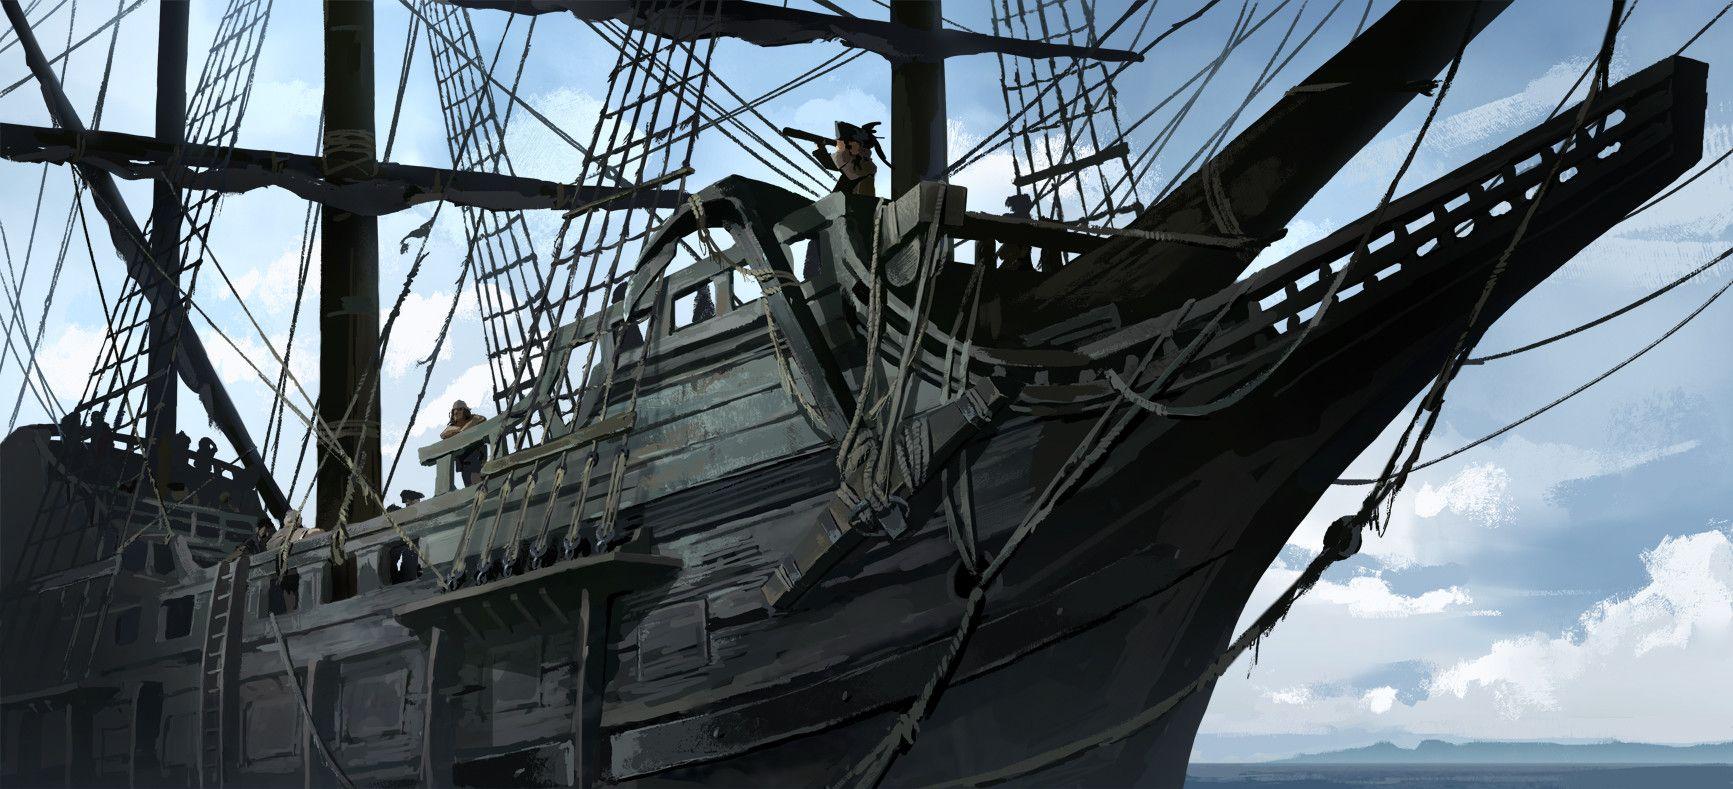 pirate ship overwatch # 51